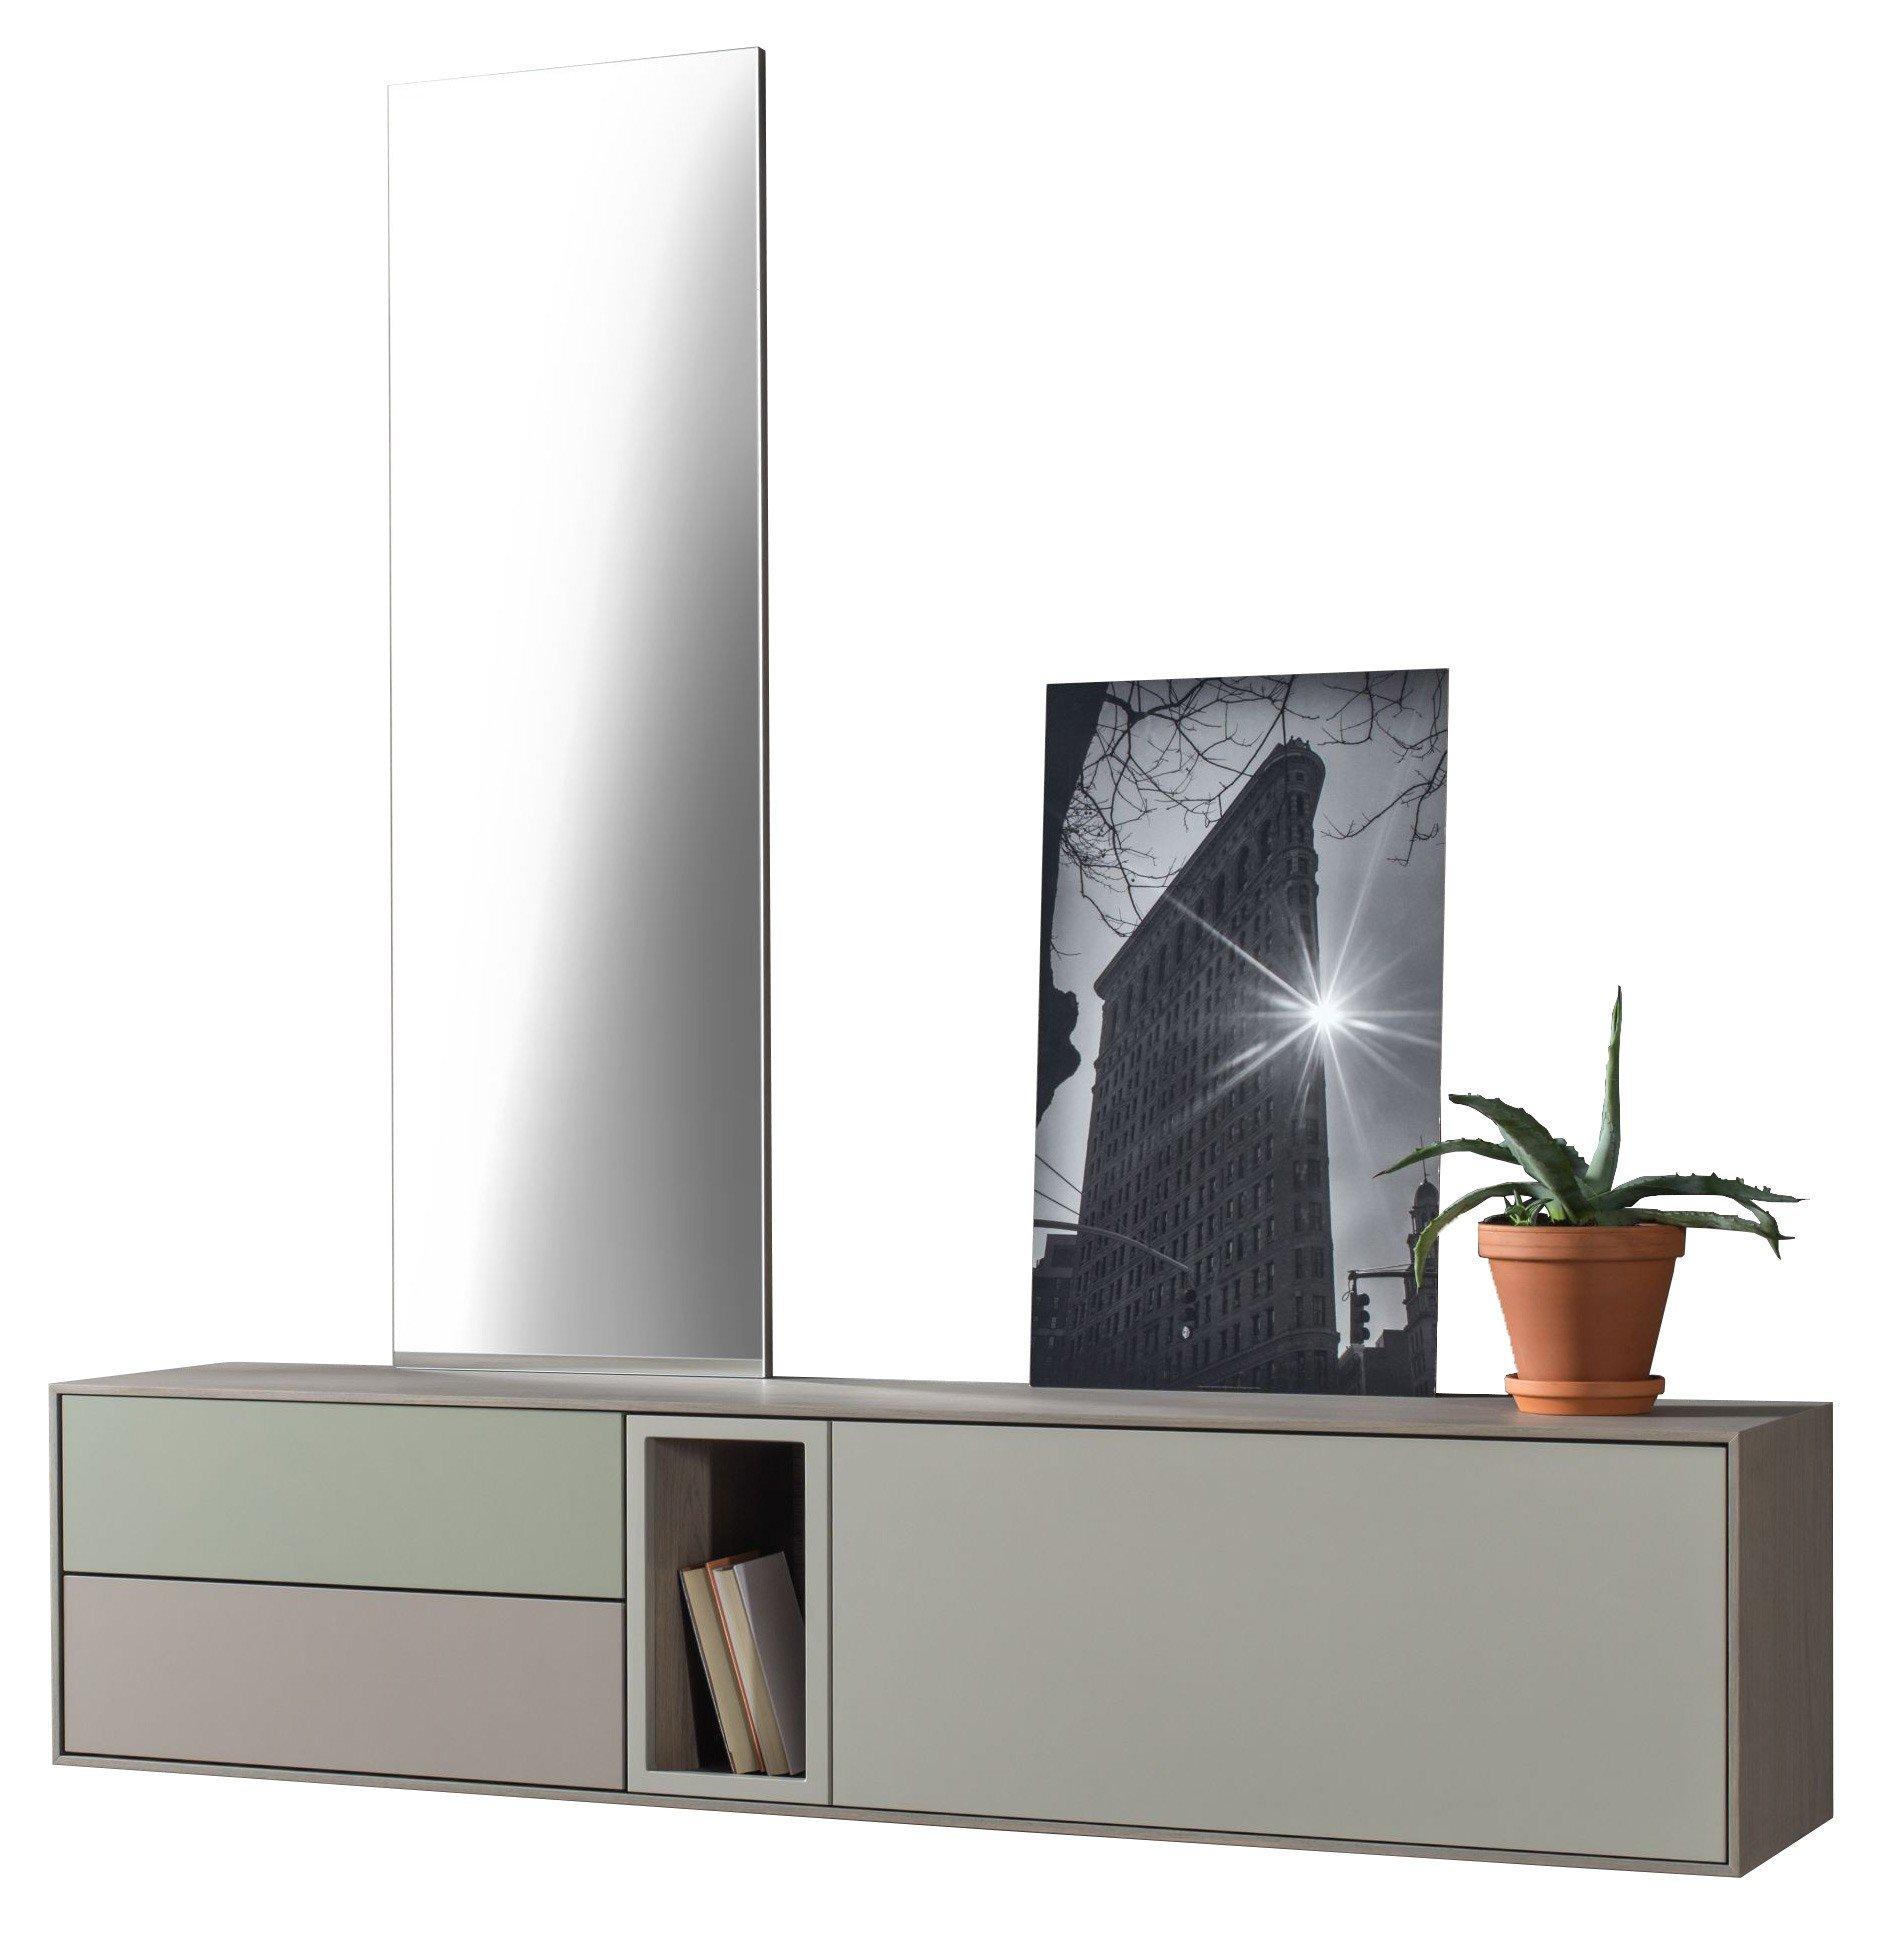 sudbrock garderobe game in gr nt nen m bel letz ihr online shop. Black Bedroom Furniture Sets. Home Design Ideas